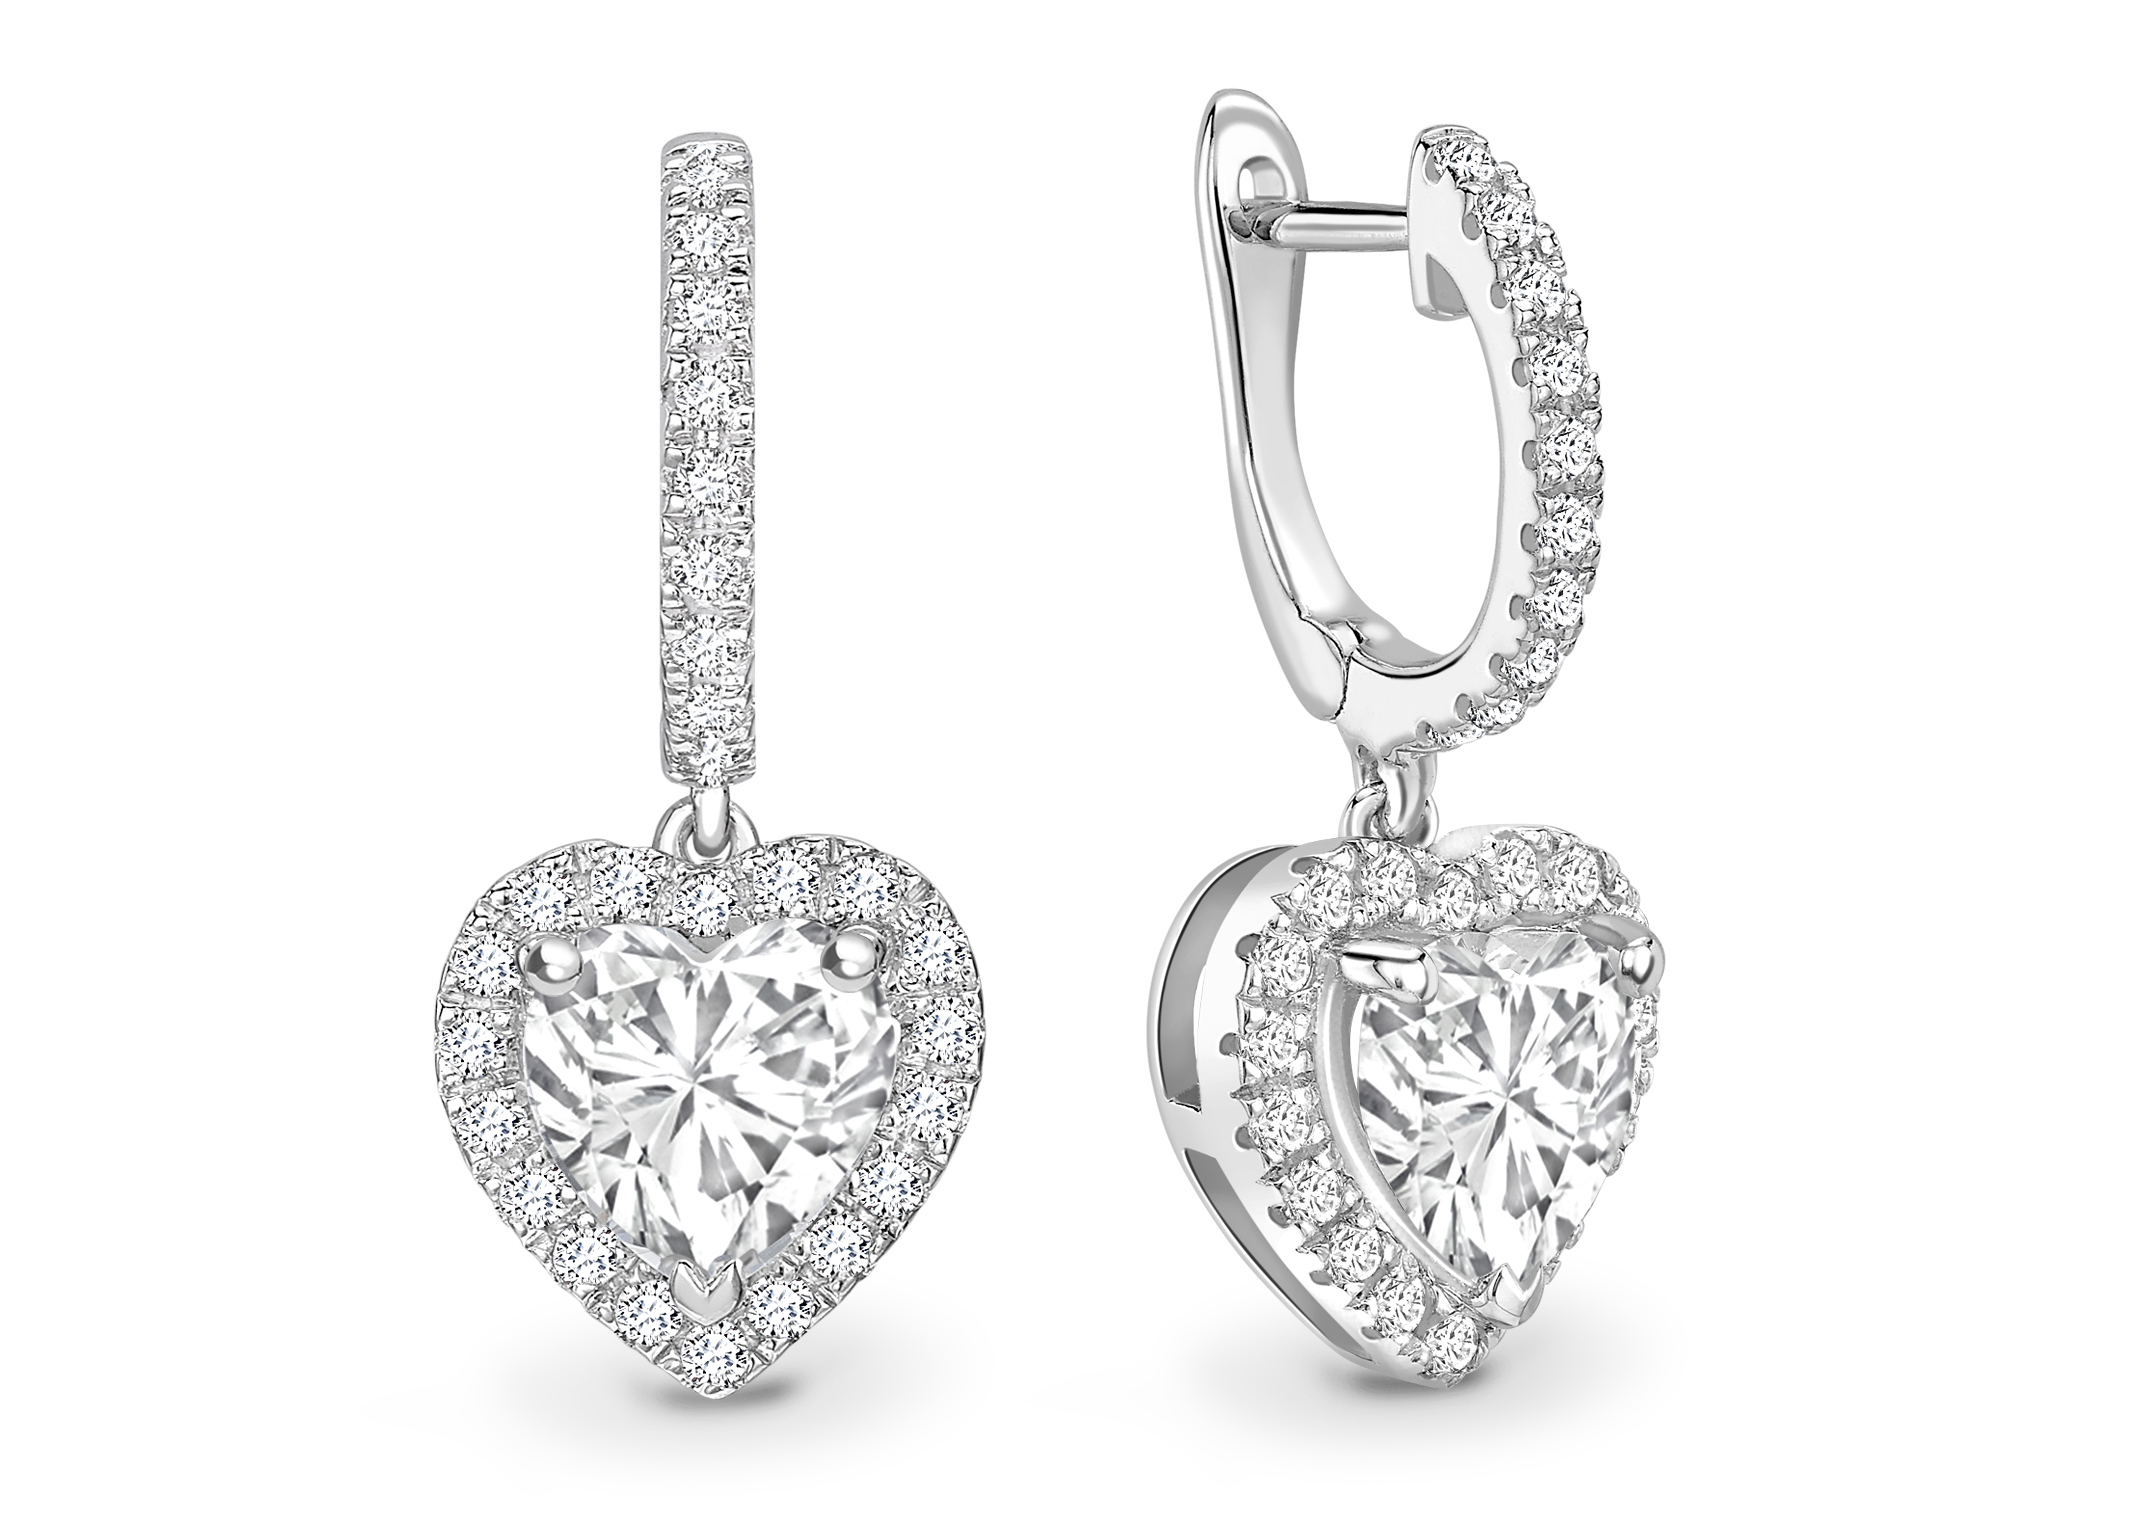 18ct White Gold Heart Shape Halo Drop Earring 1.74 Carats